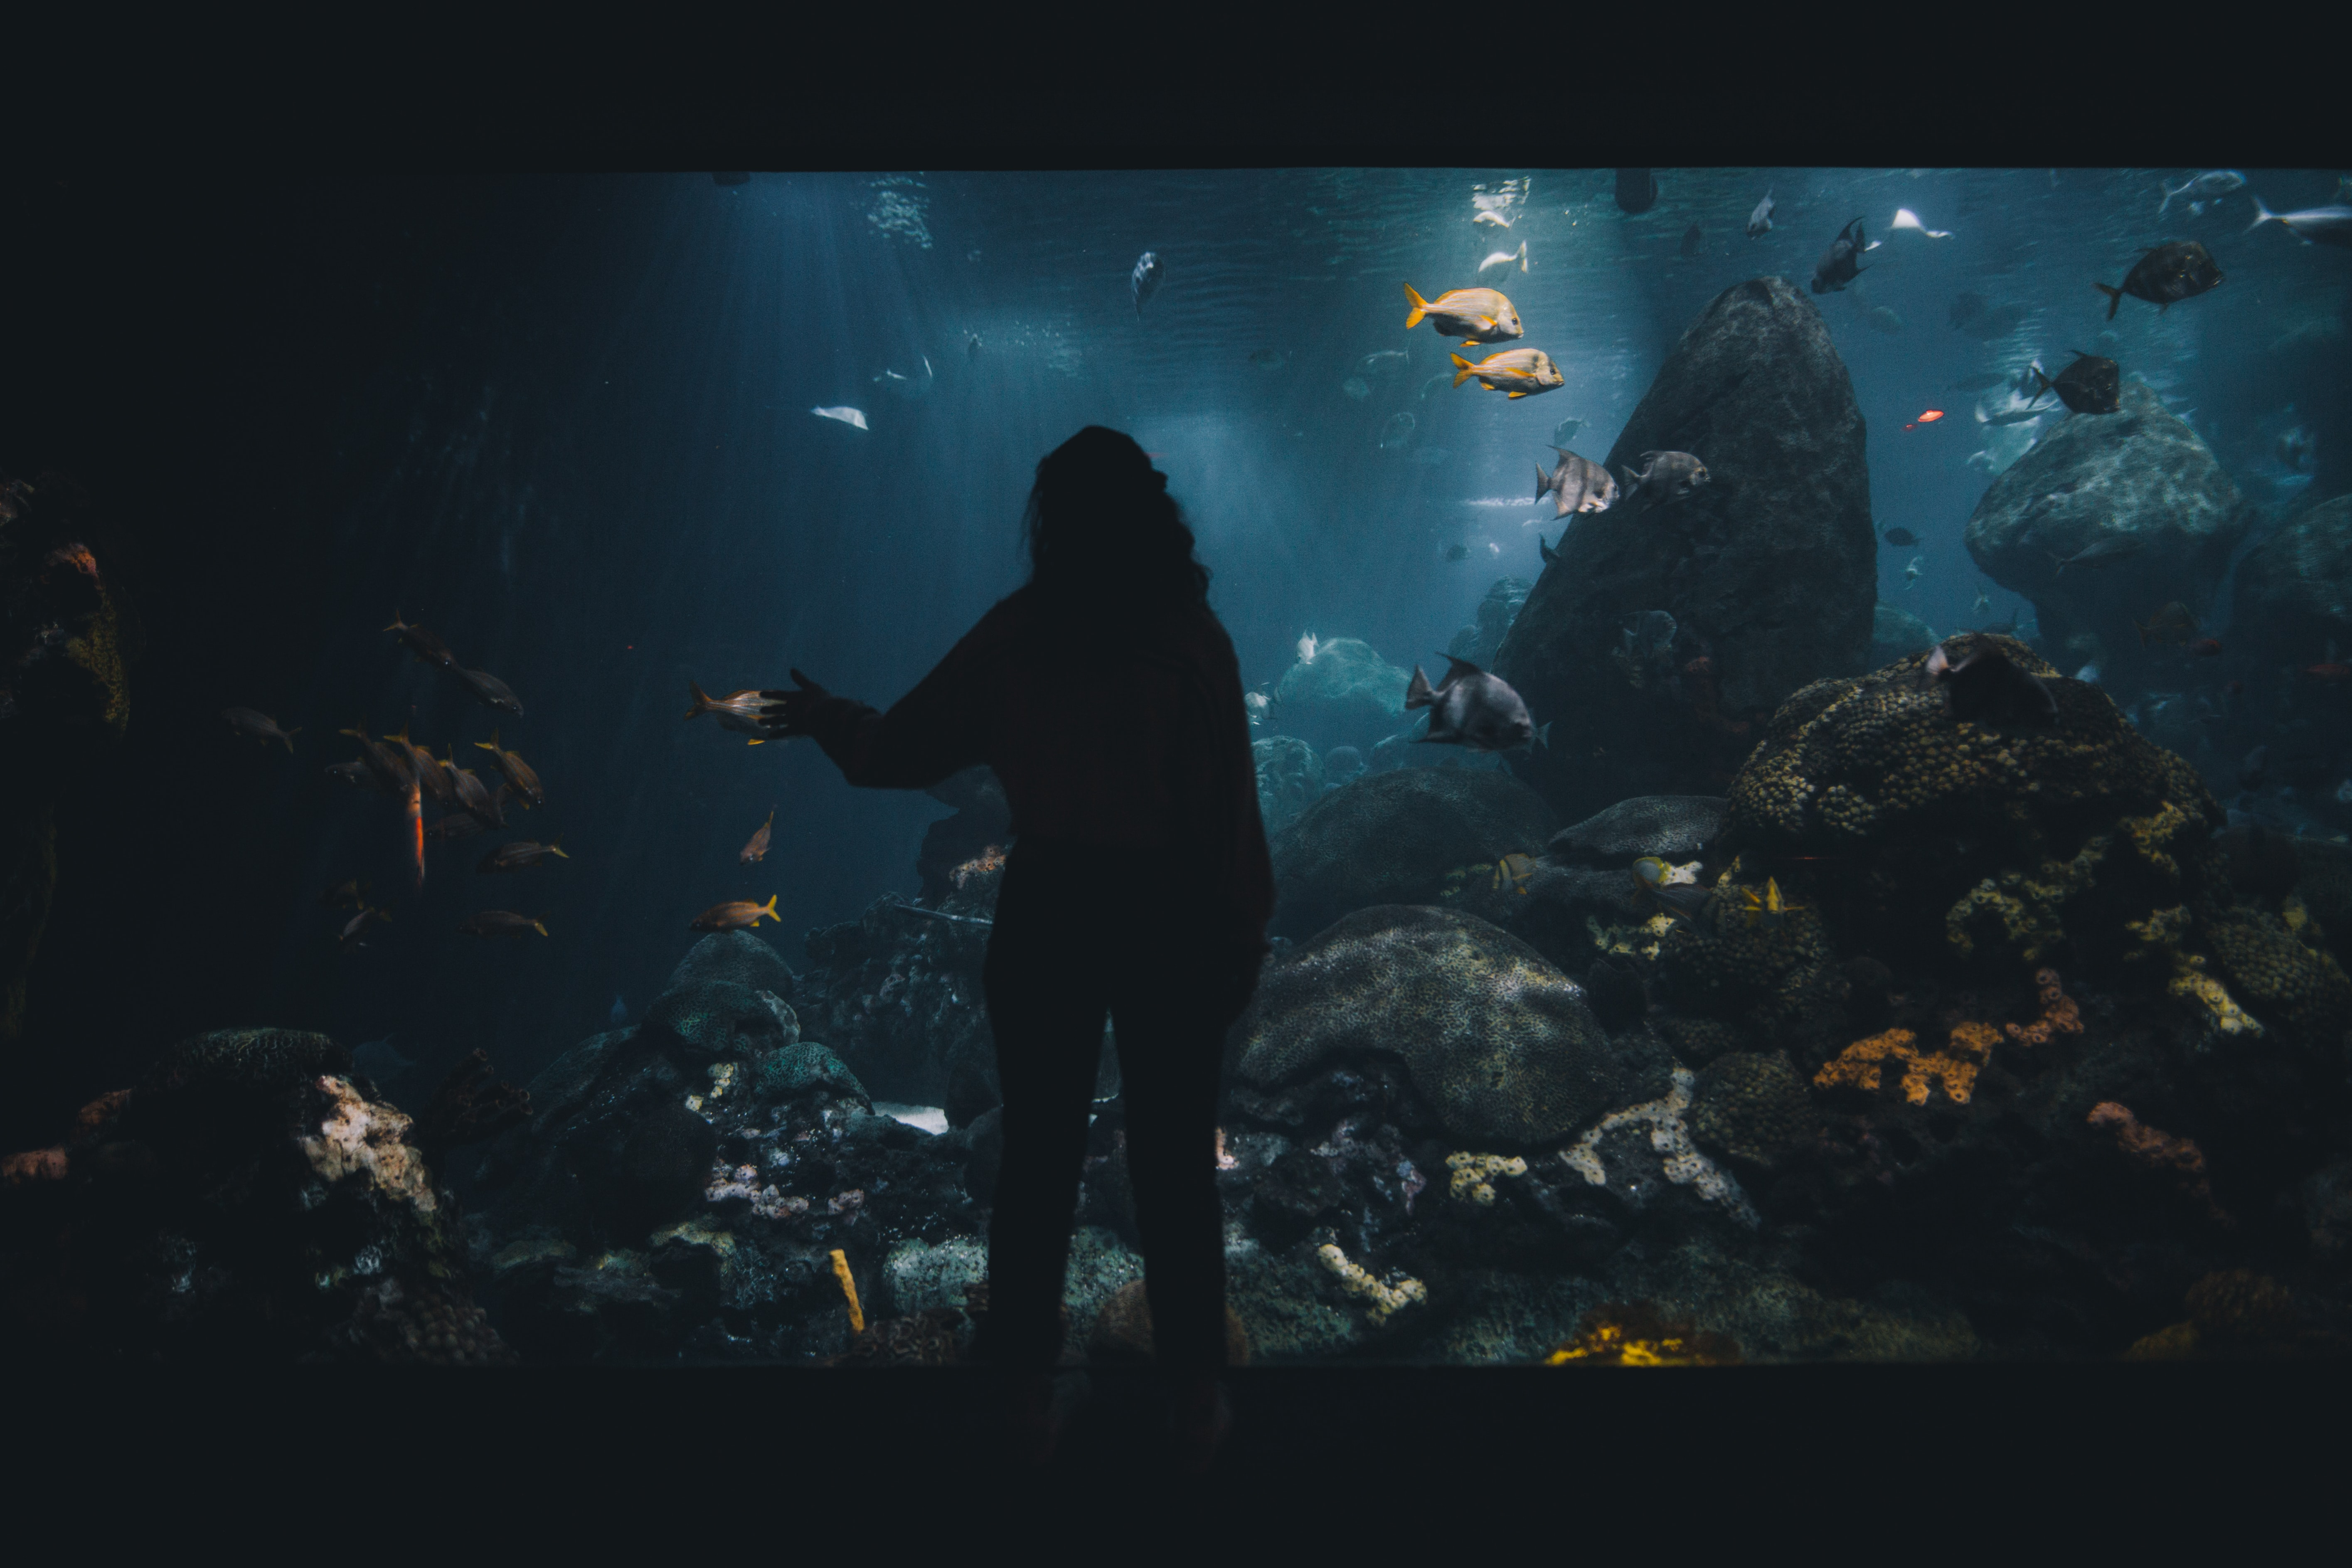 woman facing large aquarium